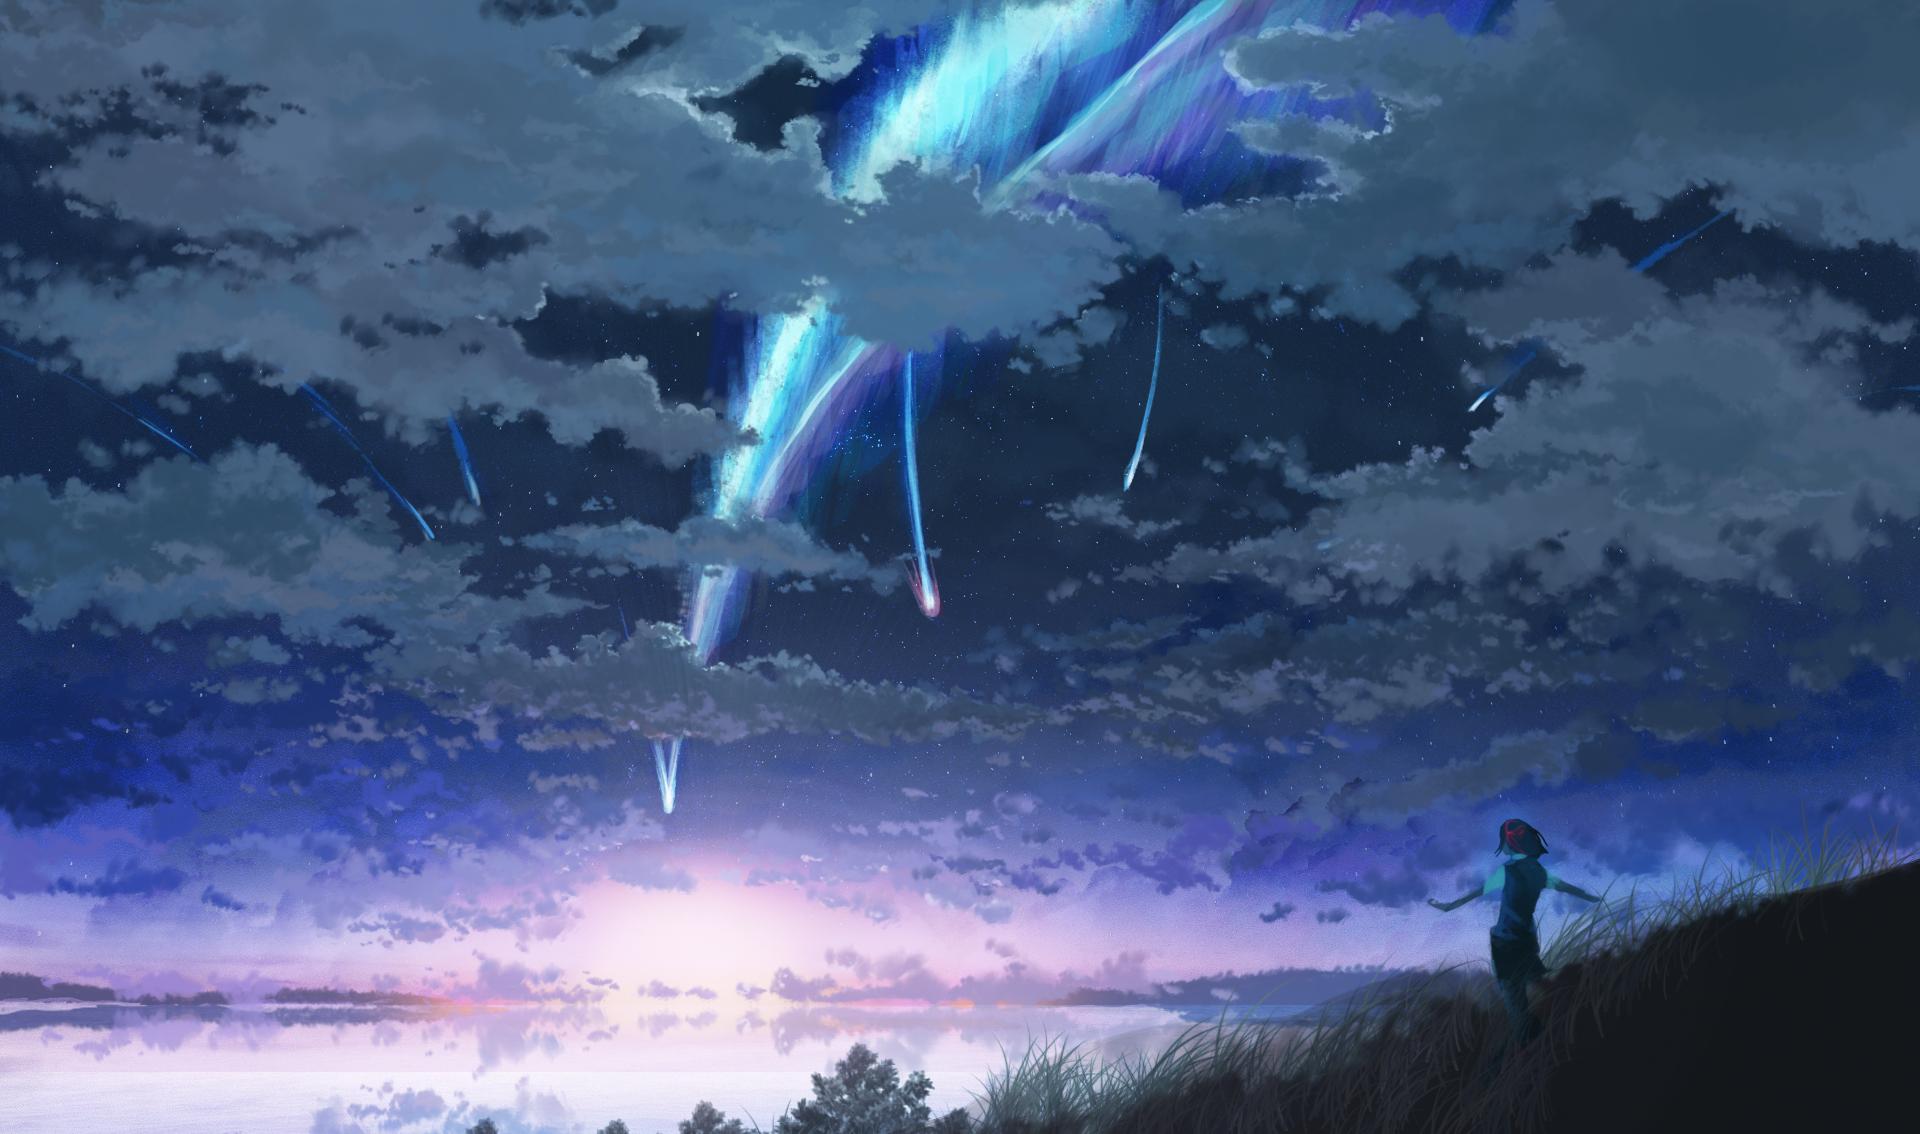 Anime Your Name Kimi No Na Wa Mitsuha Miyamizu Fondo De Pantalla Fondos De Escritorio Pantalla De Pc Fondo De Pantalla Laptop